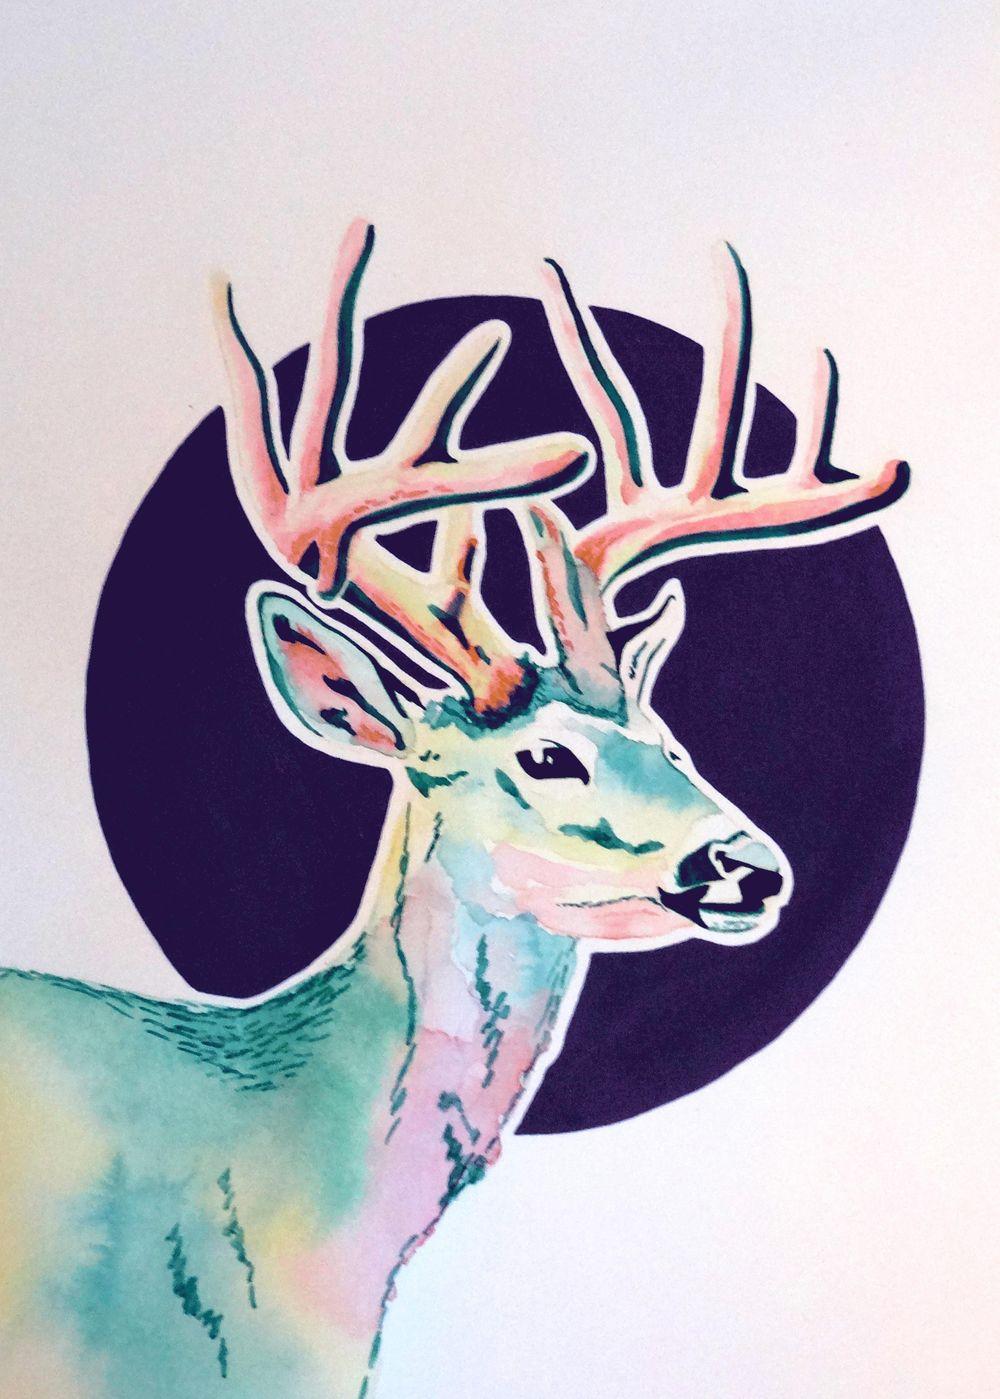 Colorsplash Animals :) - image 4 - student project